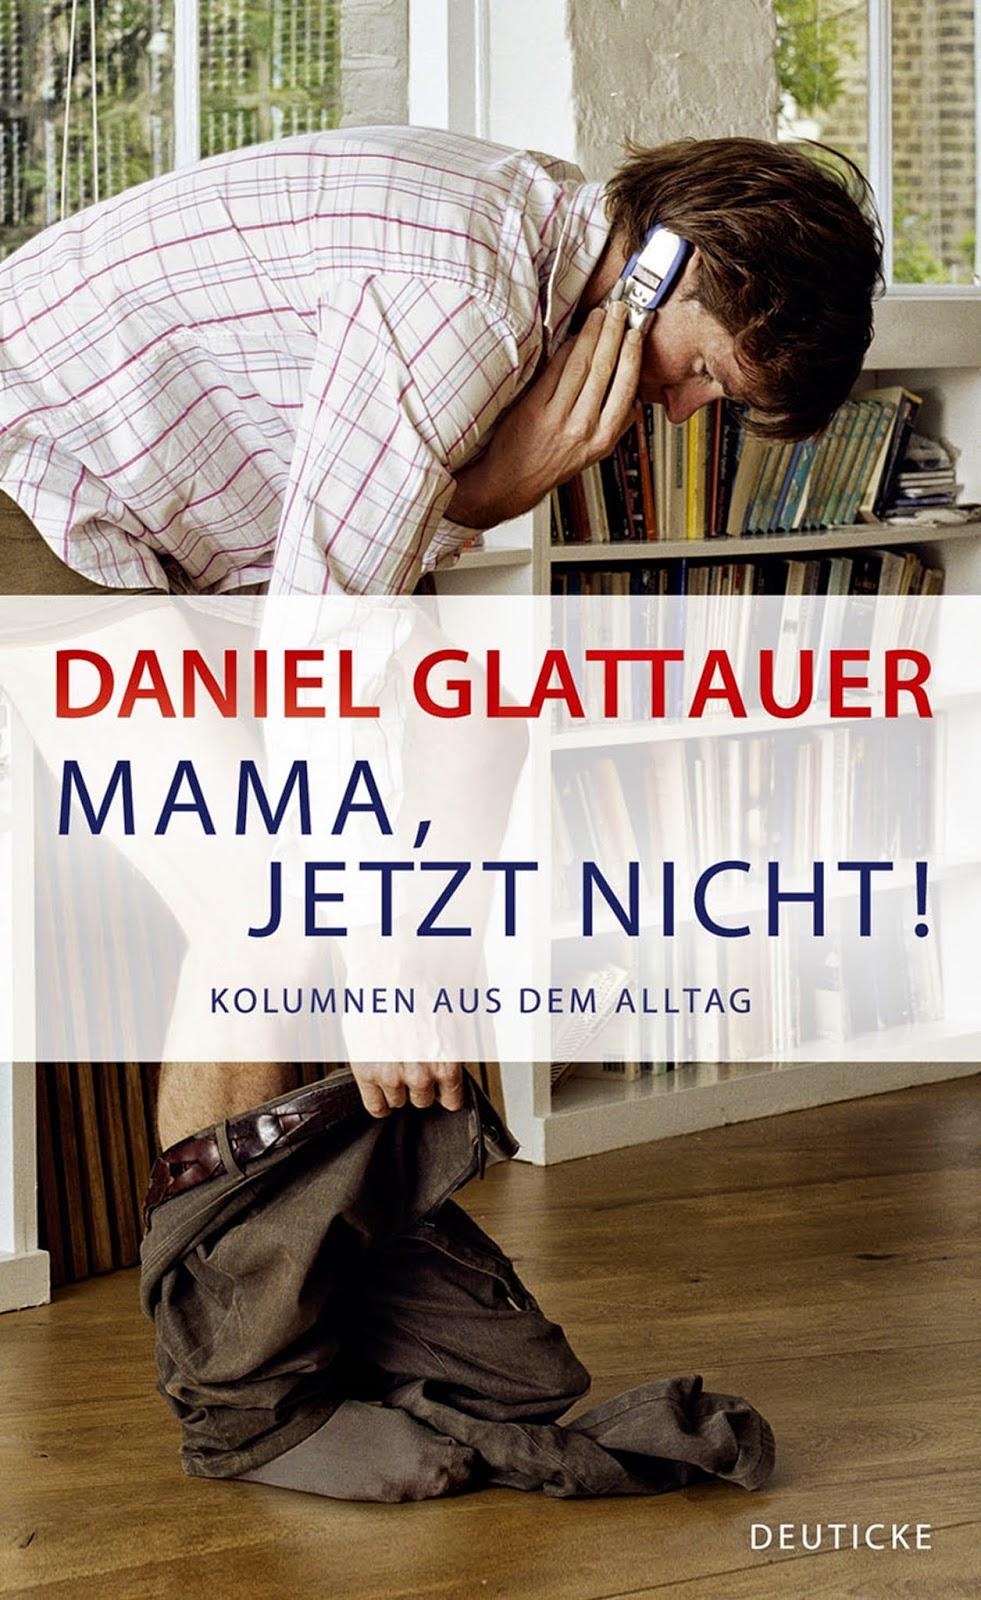 http://www.hanser-literaturverlage.de/buecher/buch.html?isbn=978-3-552-06167-5